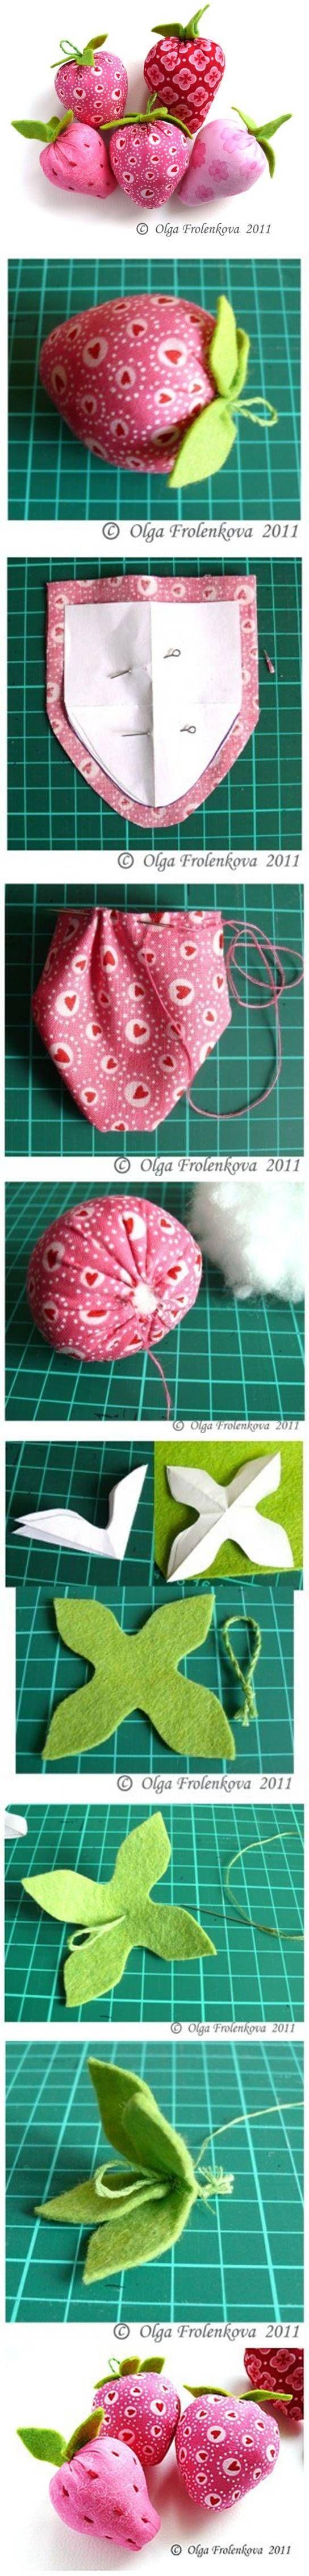 DIY Sew Fabric Strawberry